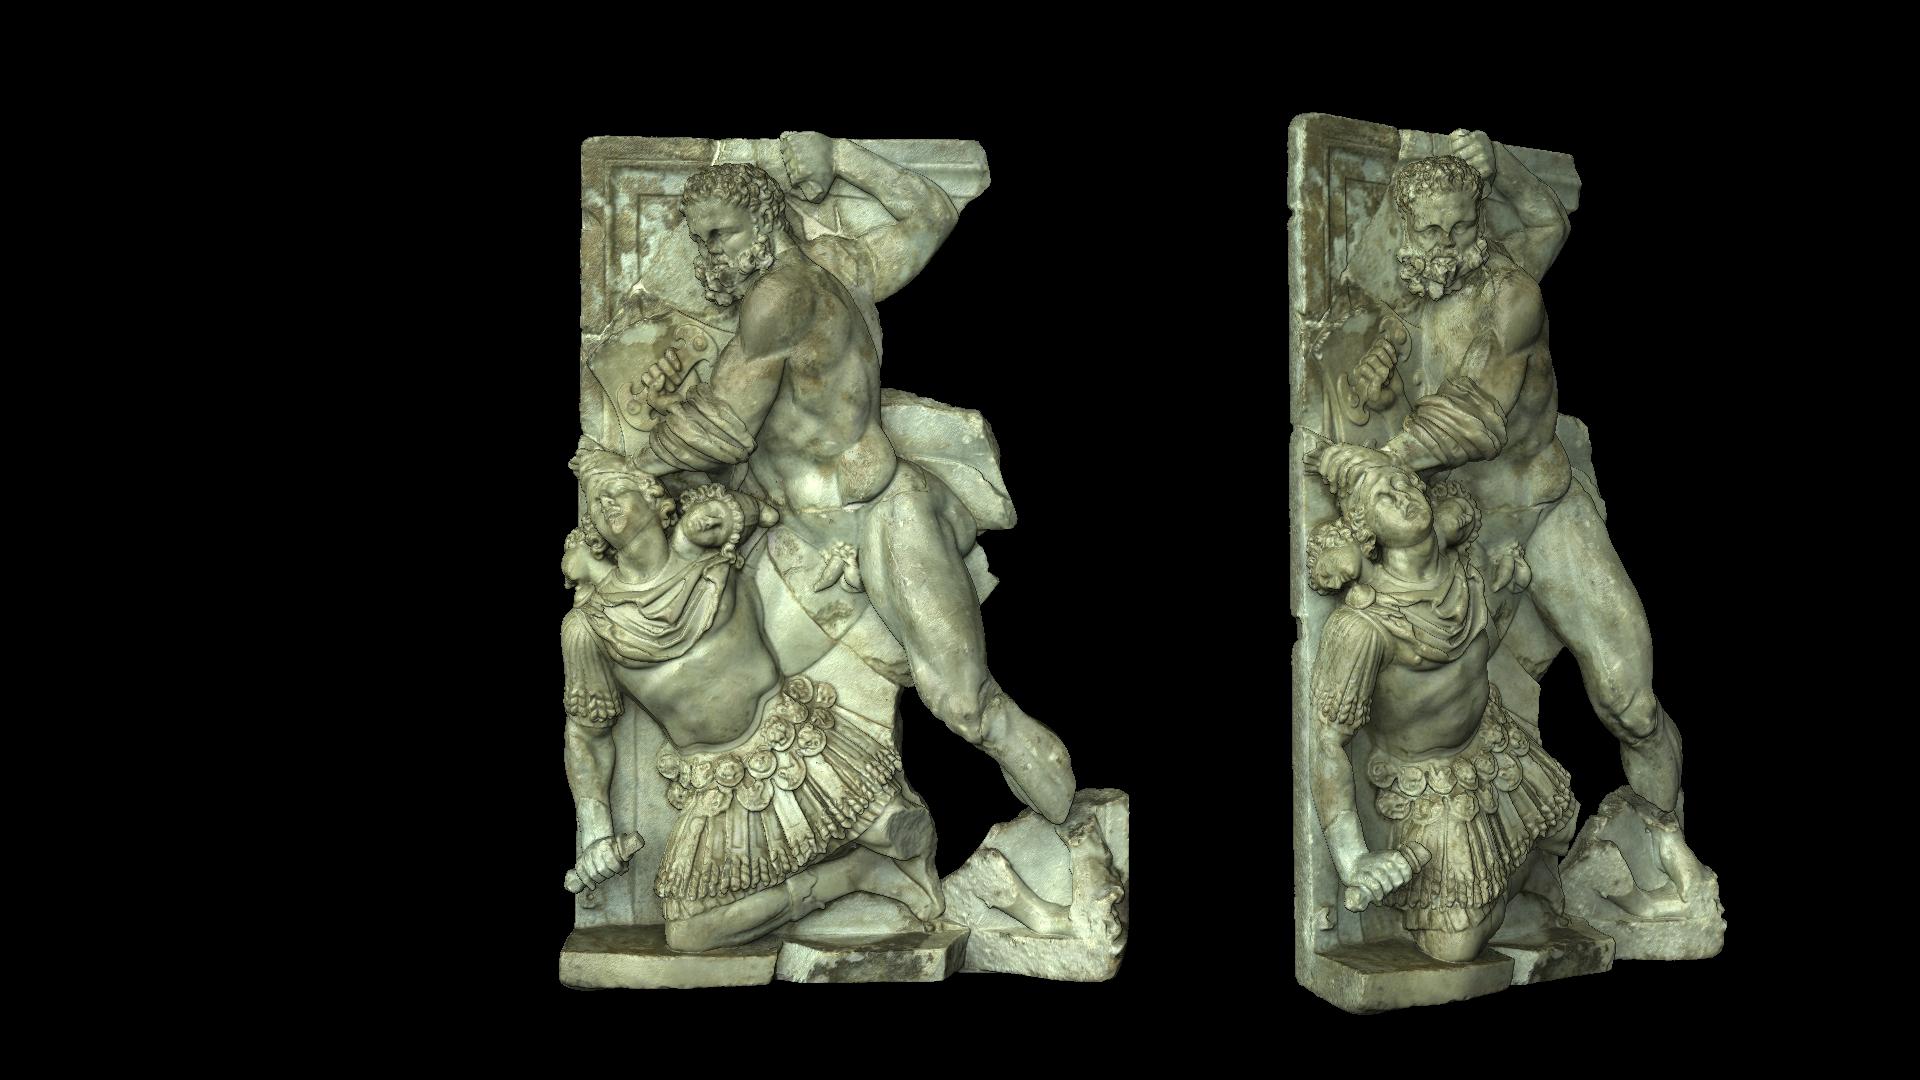 Musée Saint-Raymond - Hercules - Numérisation 3D